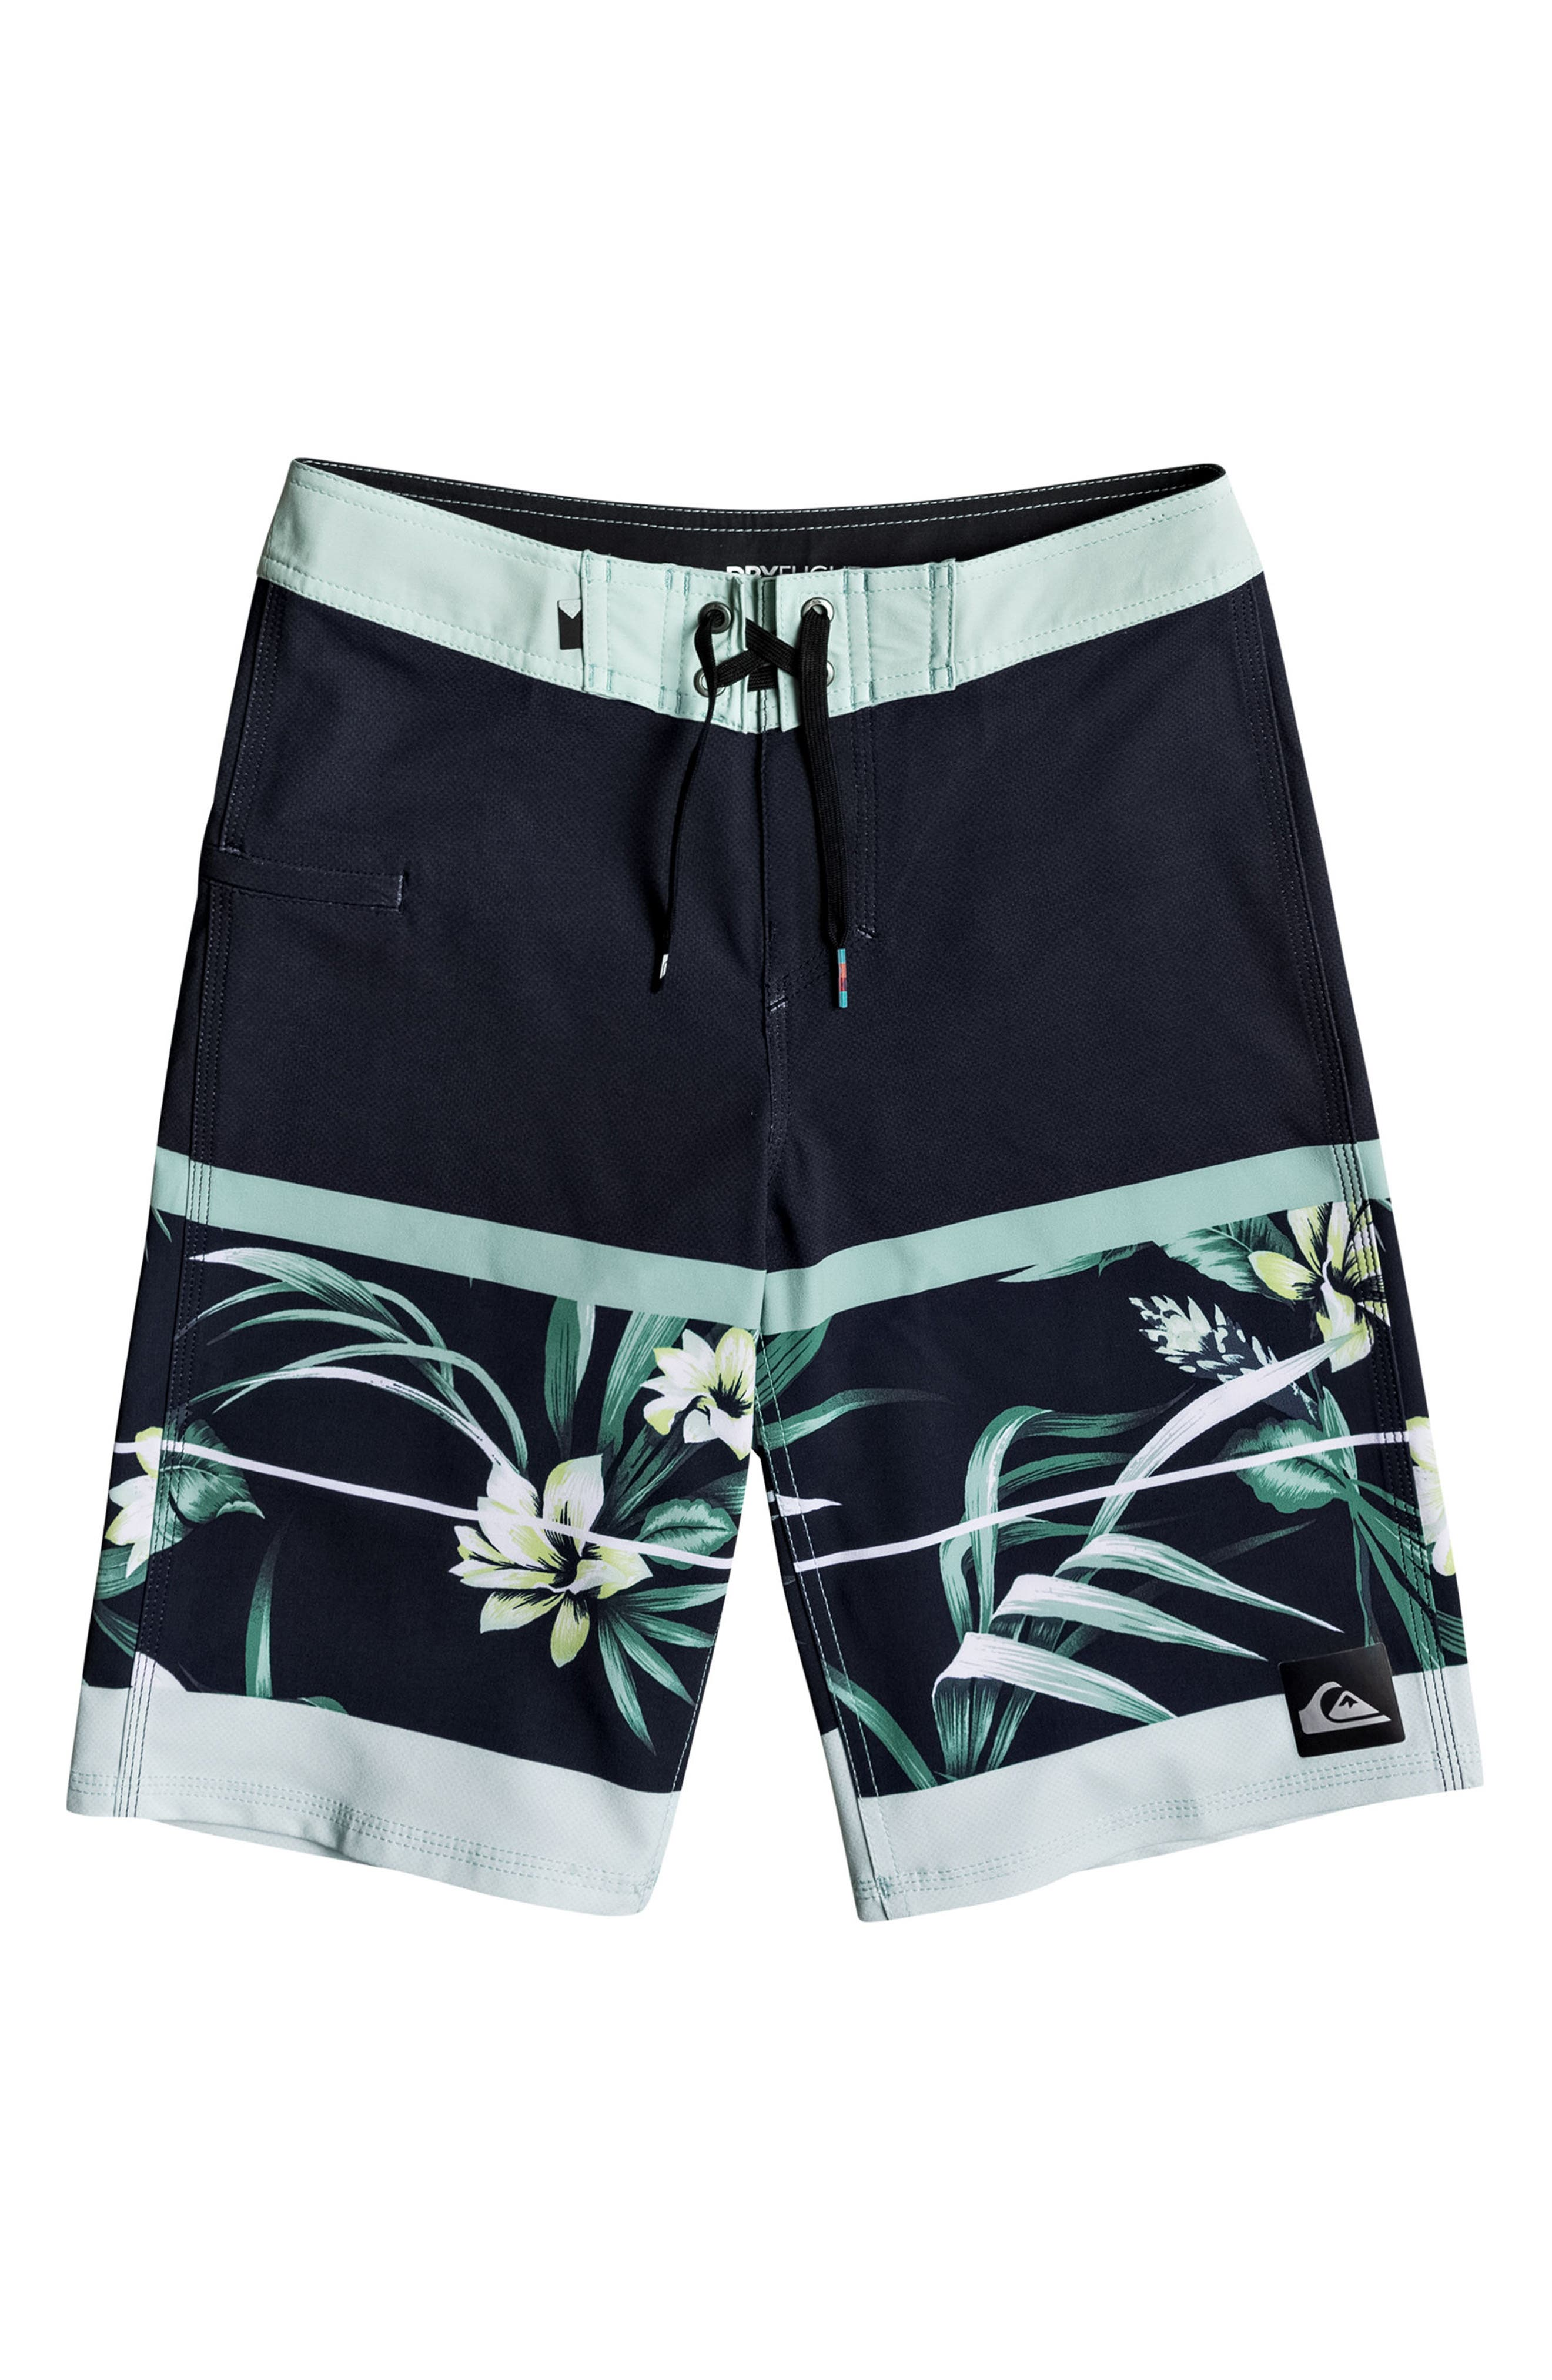 Slab Island Vee Board Shorts,                         Main,                         color, Navy Blazer